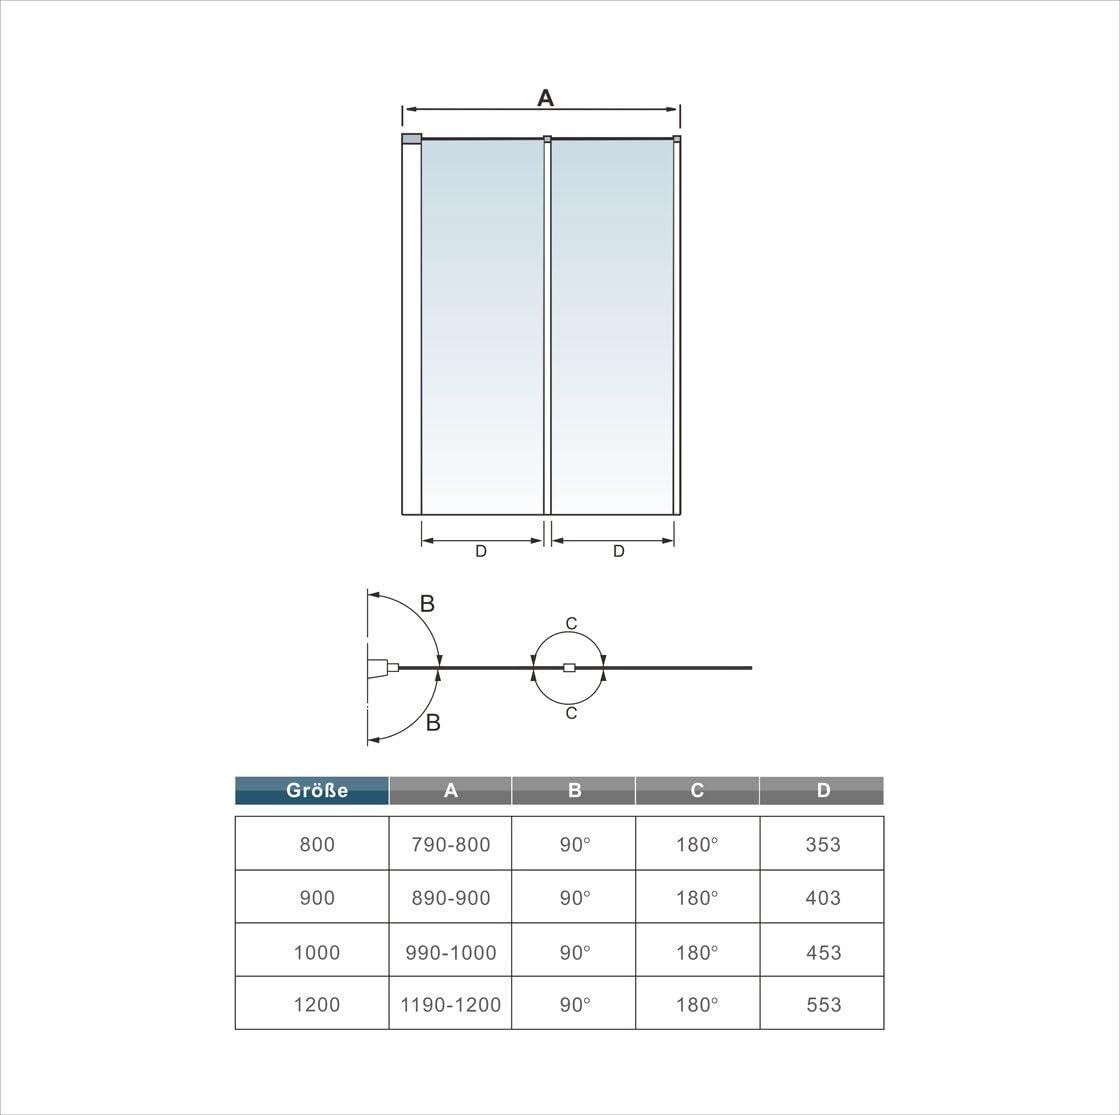 Mamparas de Ba/ñera Biombo Plegable Cristal 4mm Gris Mate 2 cristale plegable 90x140cm